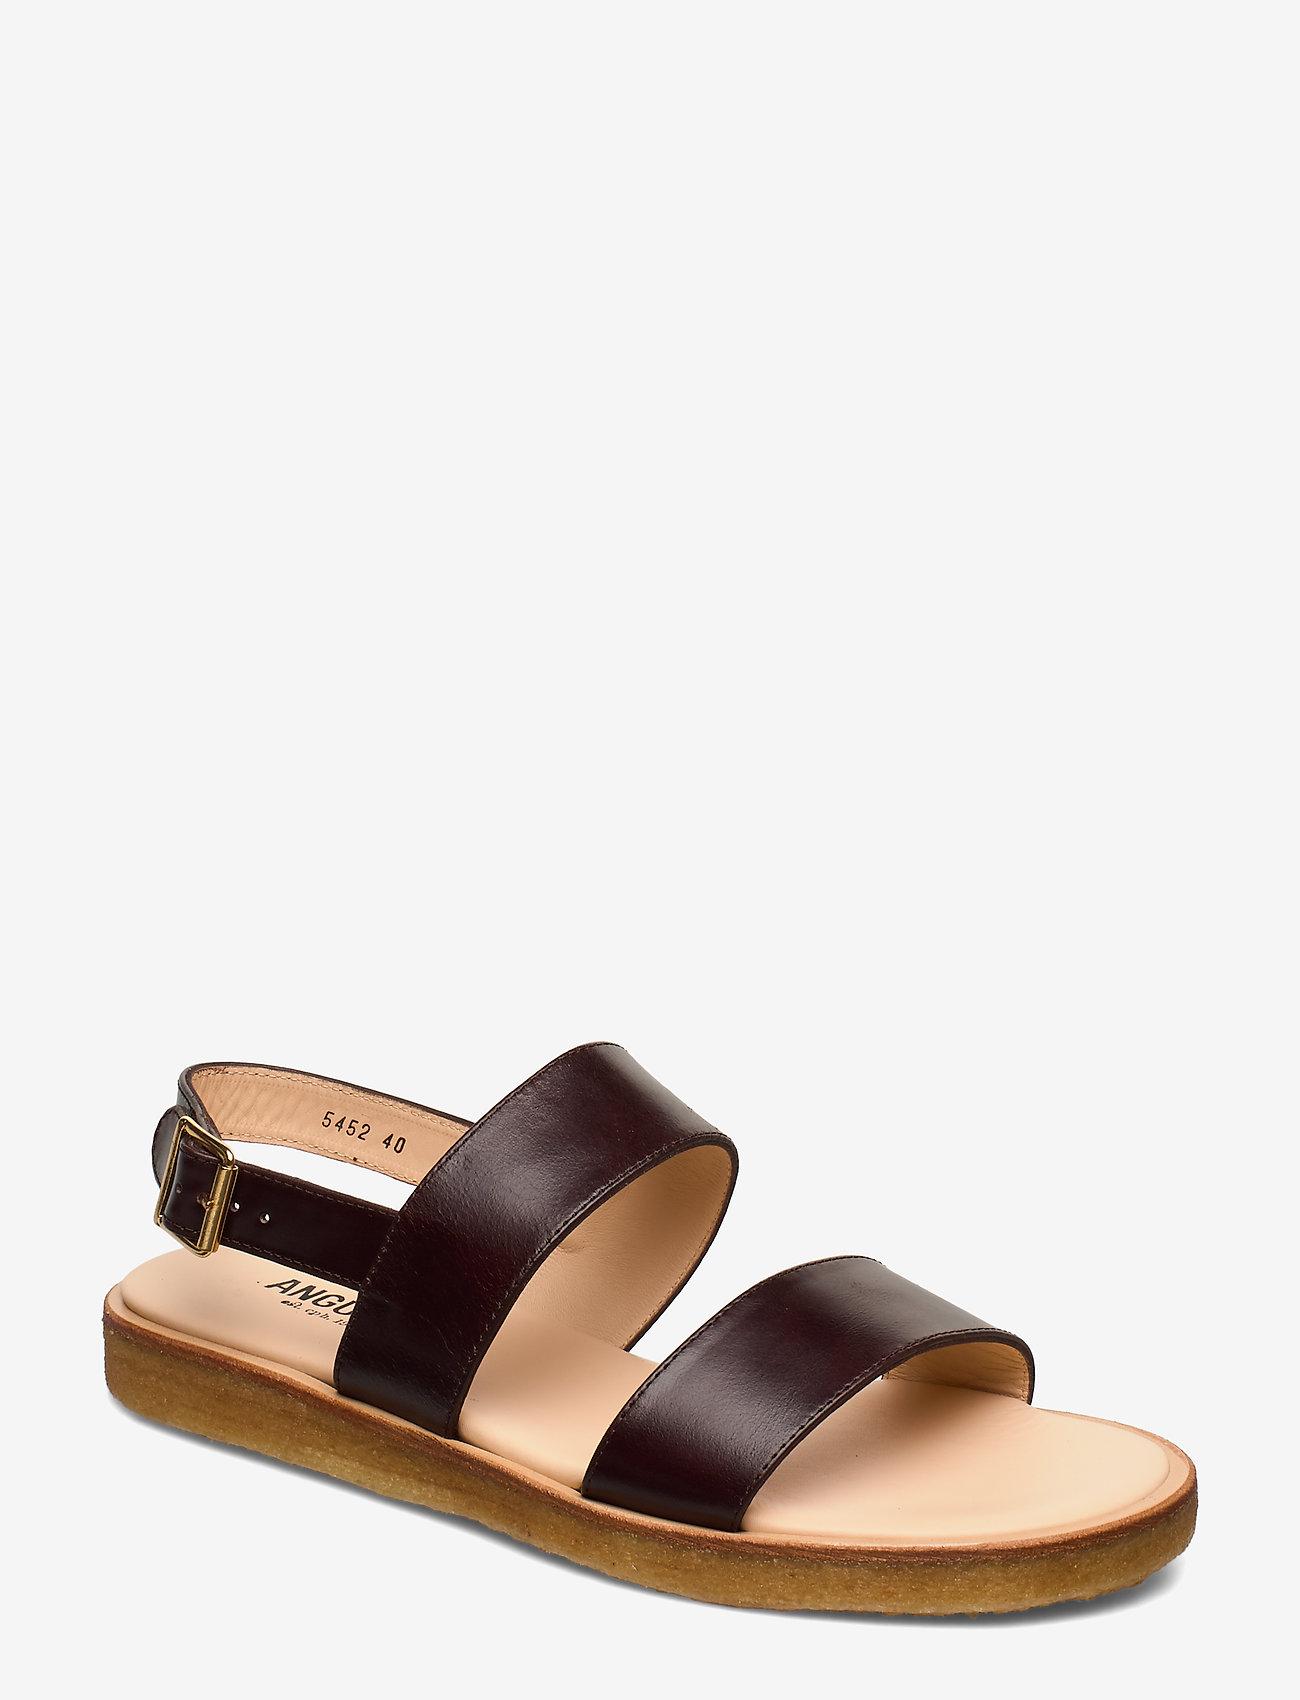 ANGULUS - 5452 - flate sandaler - 1836 dark brown - 0